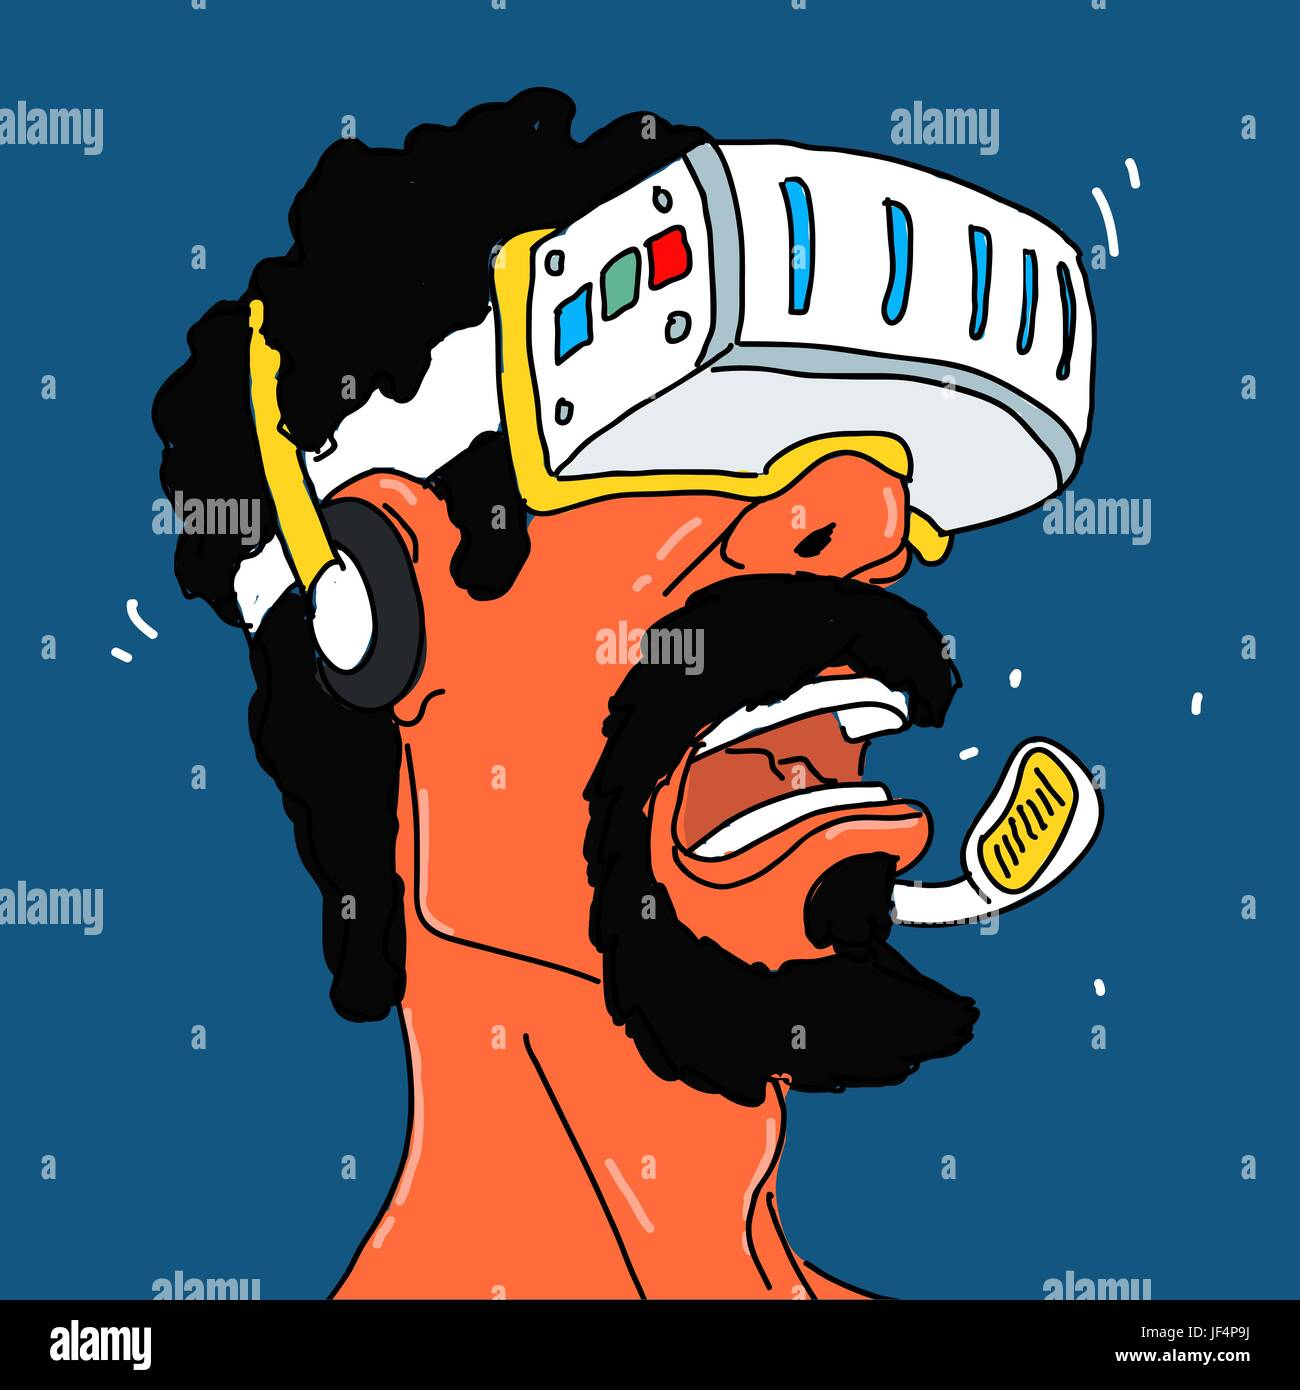 Helmet of Virtual Reality Vector Illustration - Stock Image